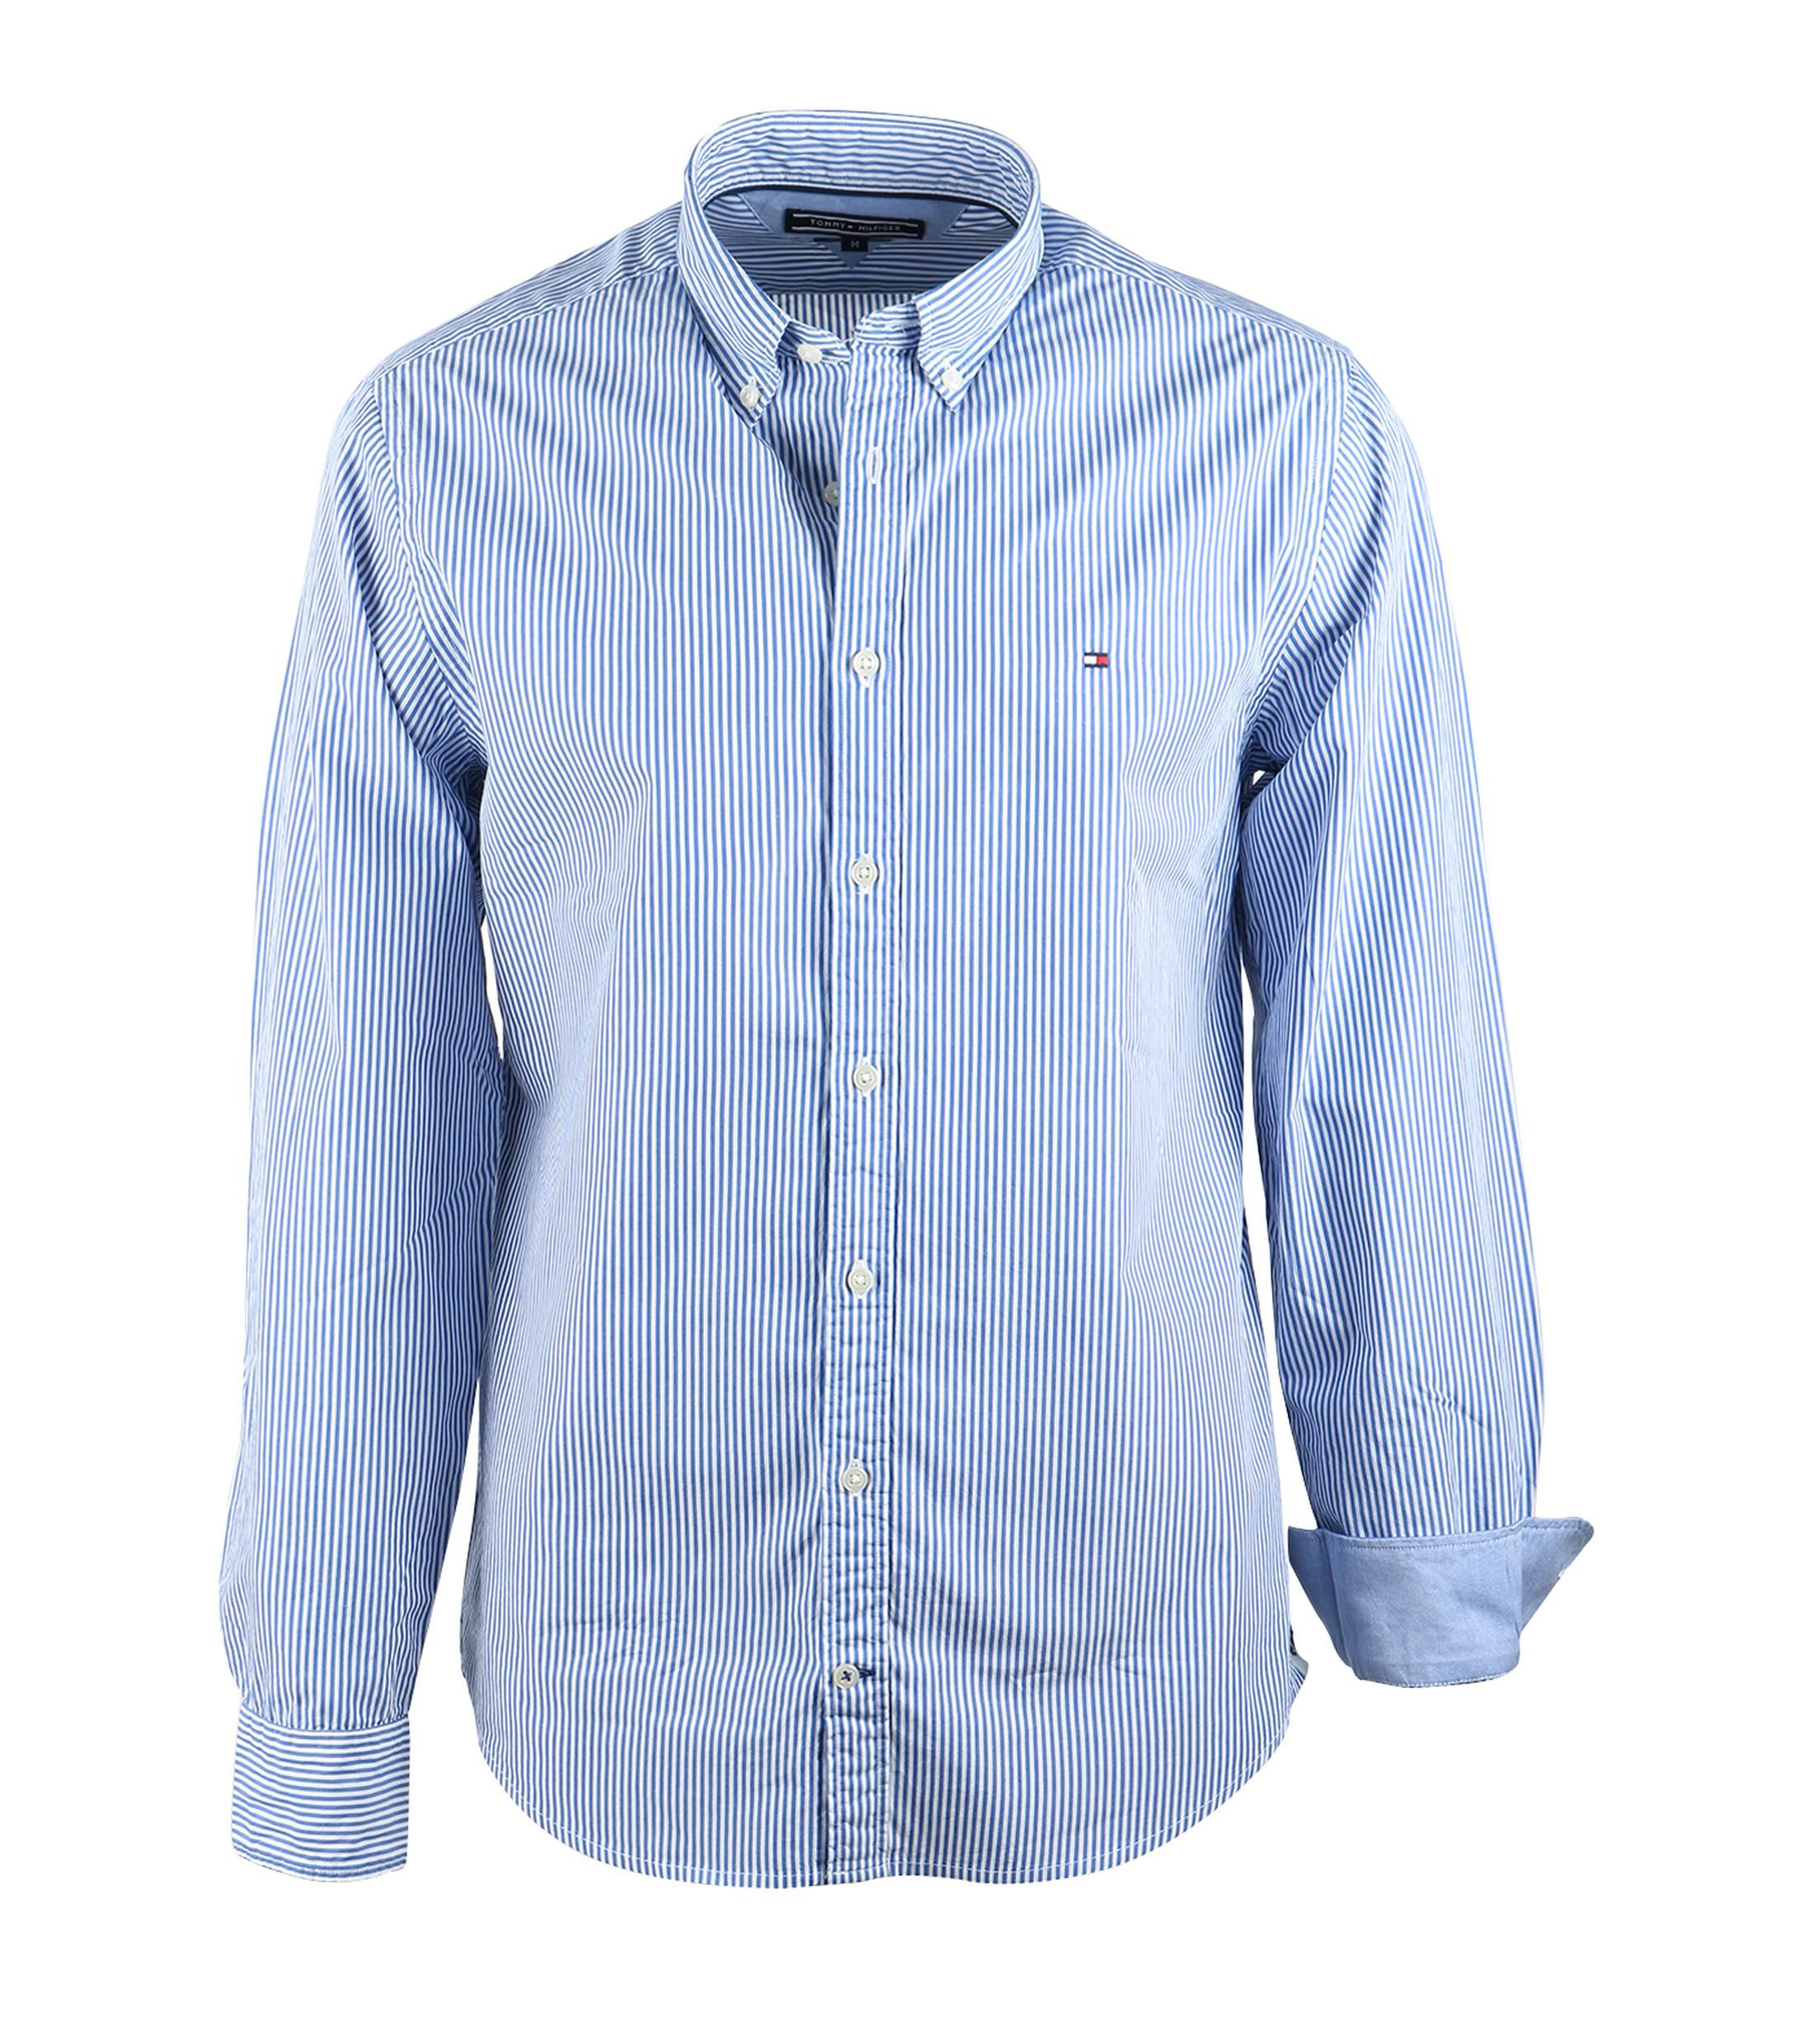 Tommy hilfiger shirt blue stripe online bestellen suitable for Tommy hilfiger fitzgerald striped shirt